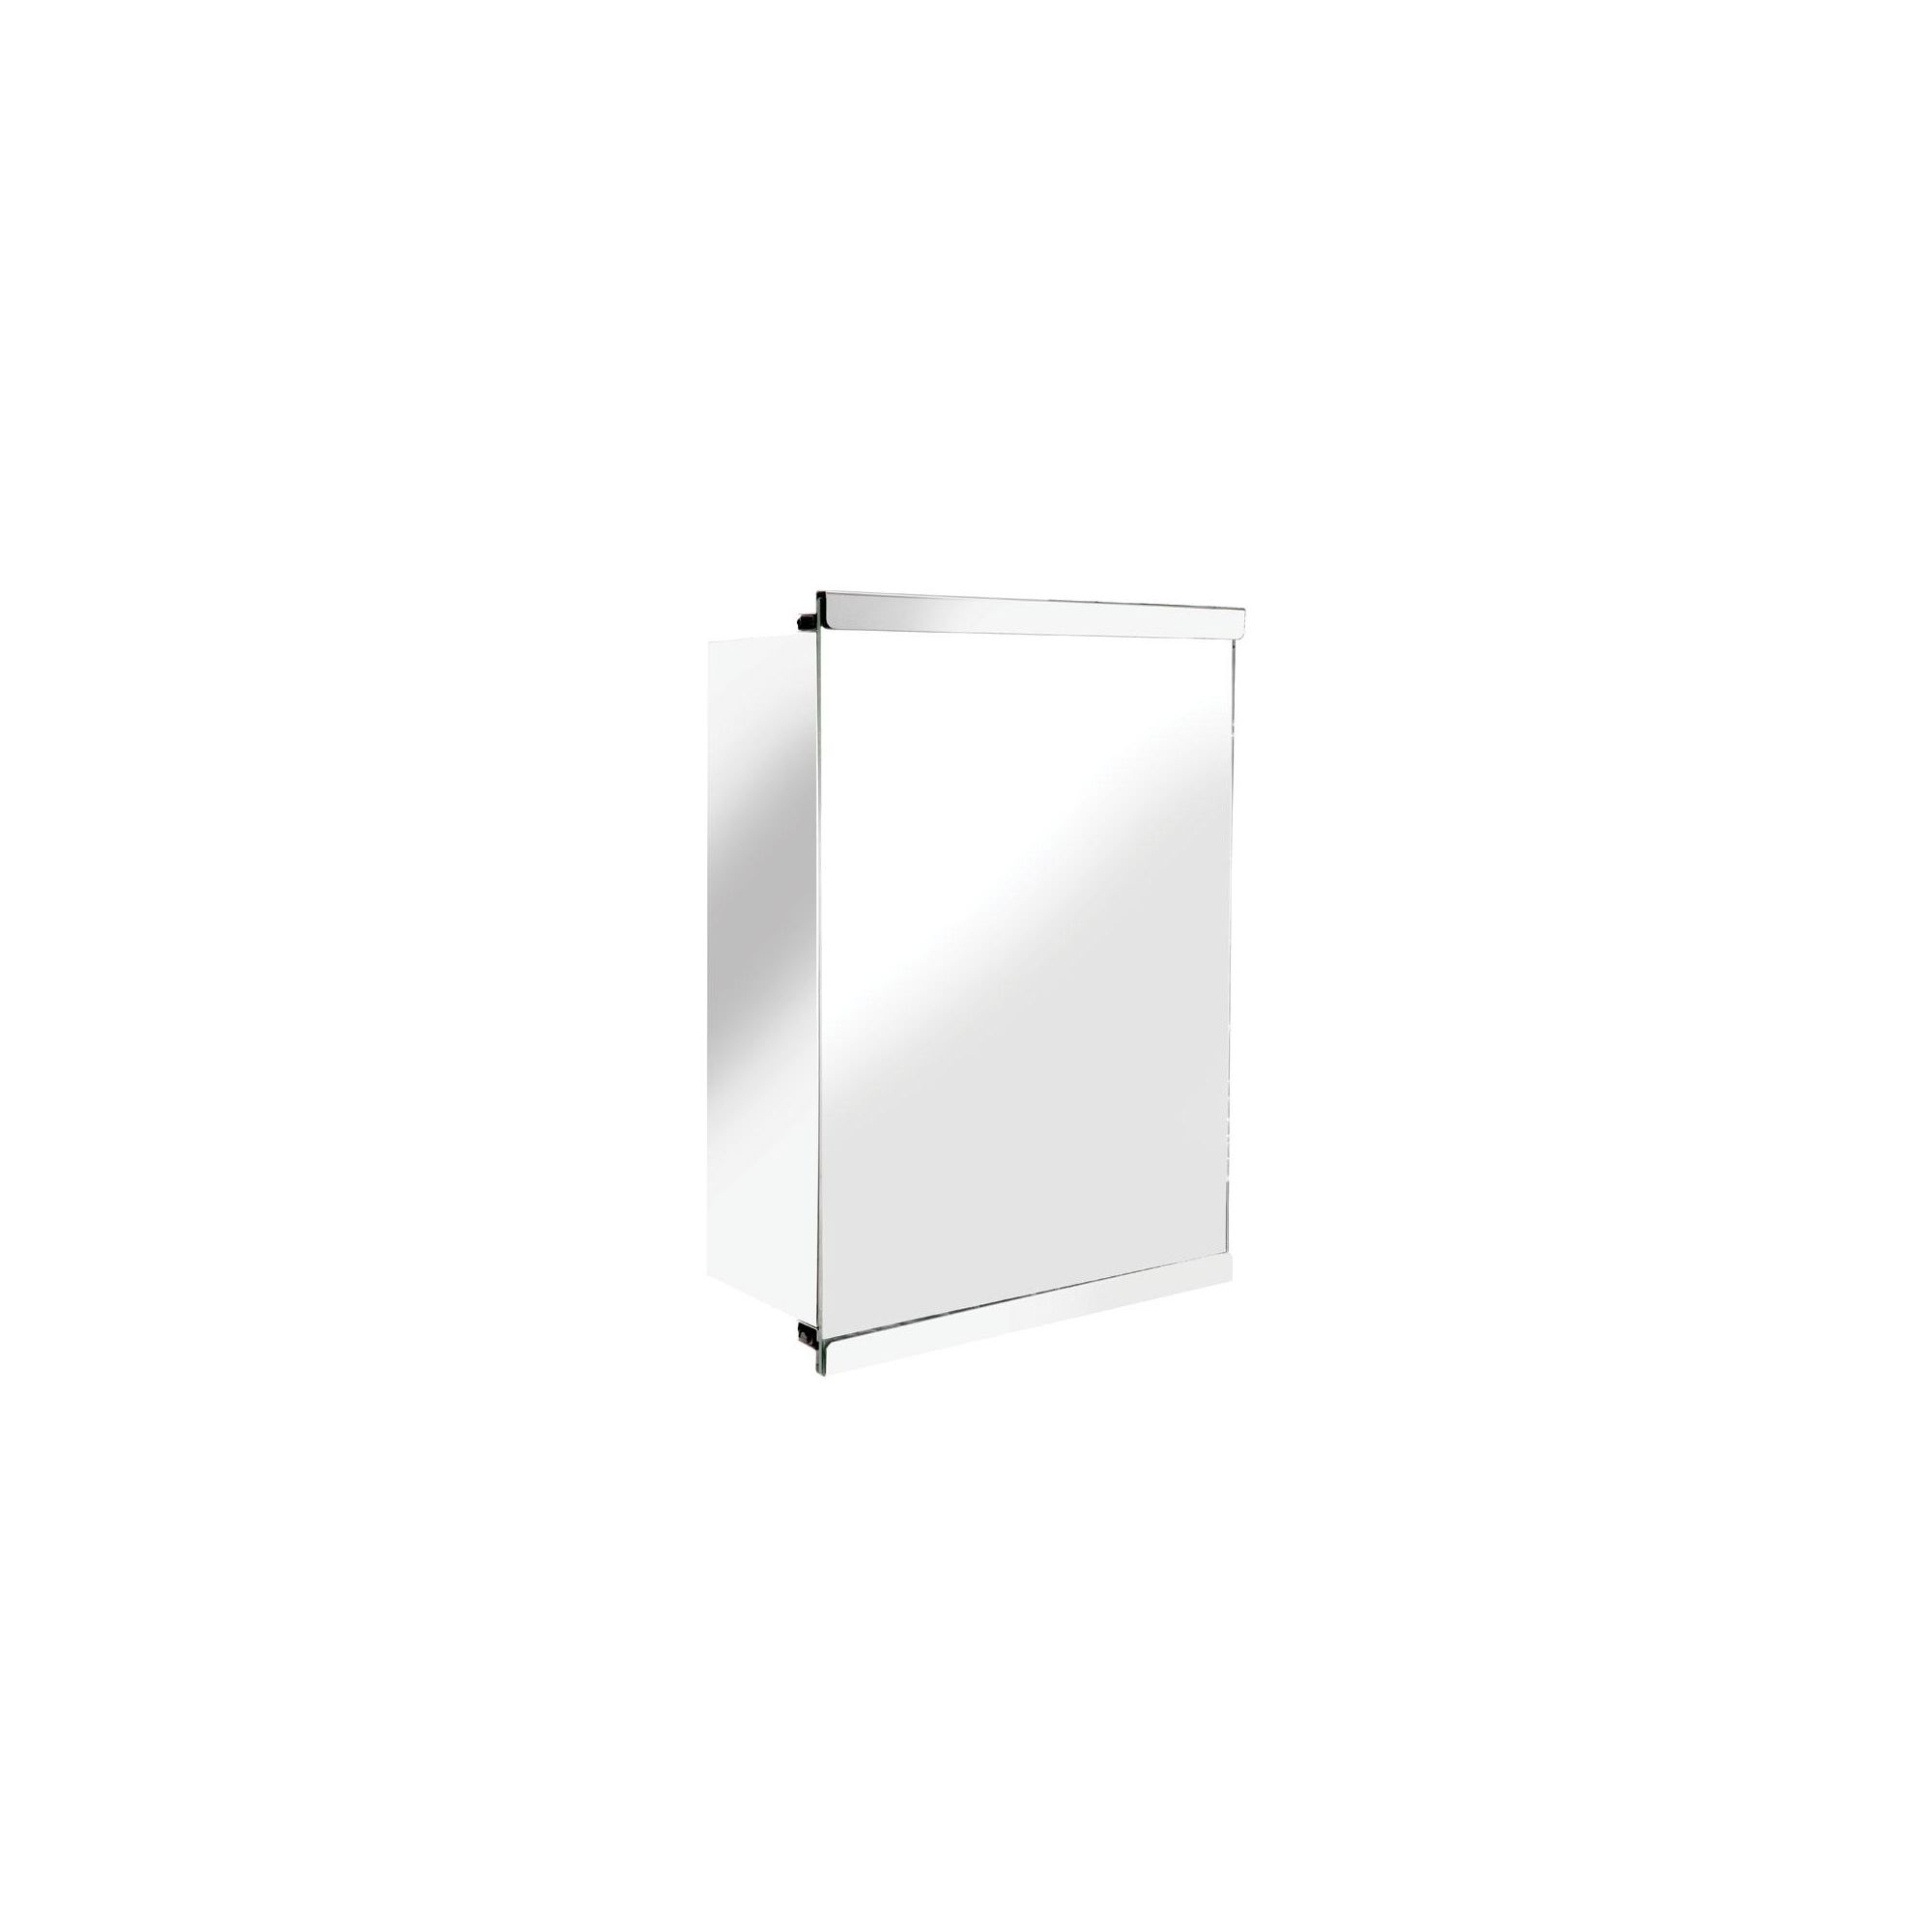 Croydex Tara Single Sliding Door Stainless Steel Cabinet